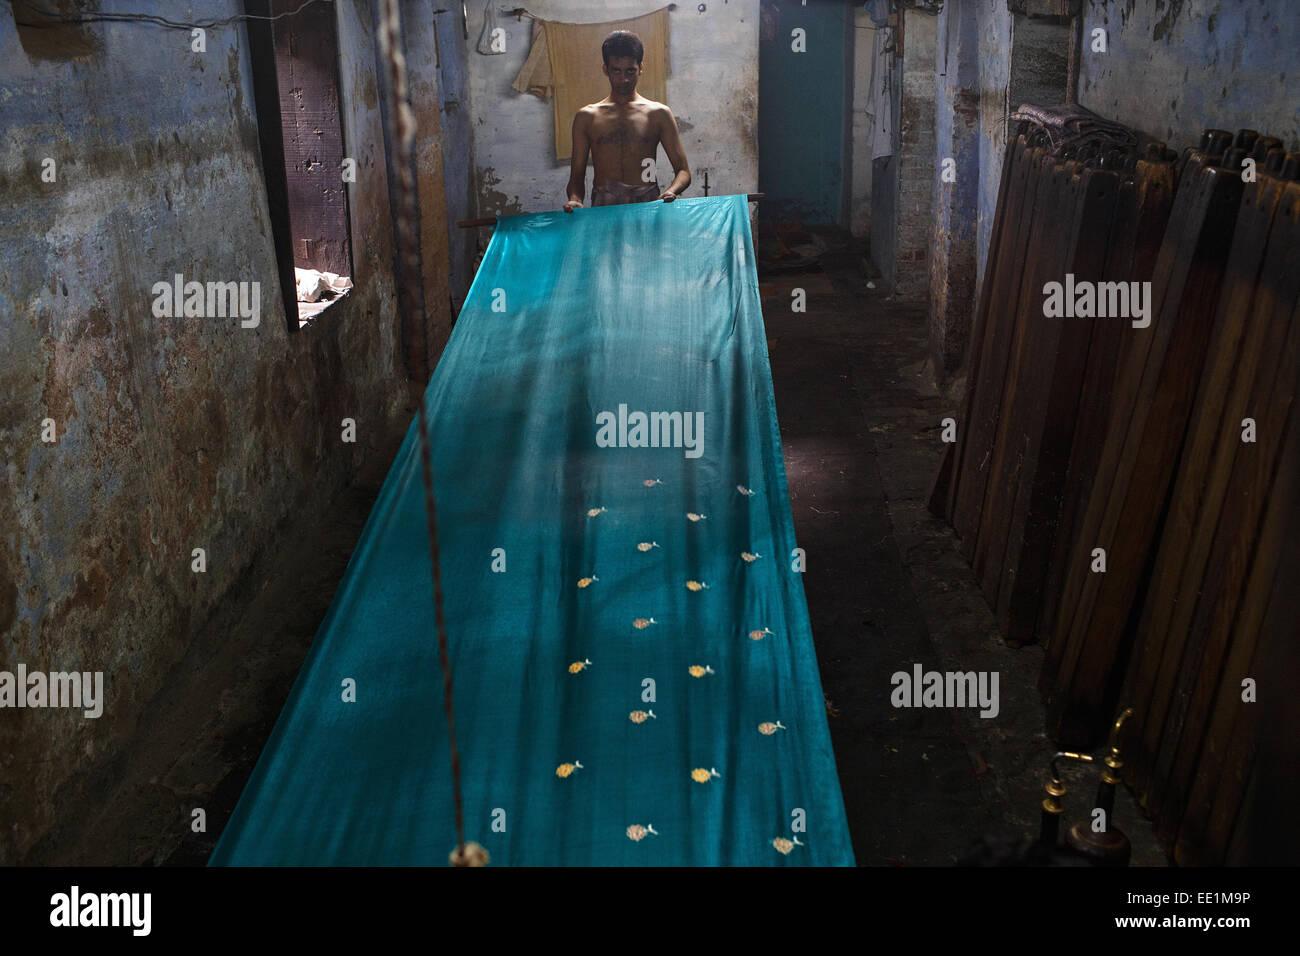 Sari (saree) tessitura fabbrica tessile di Varanasi (India). Immagini Stock